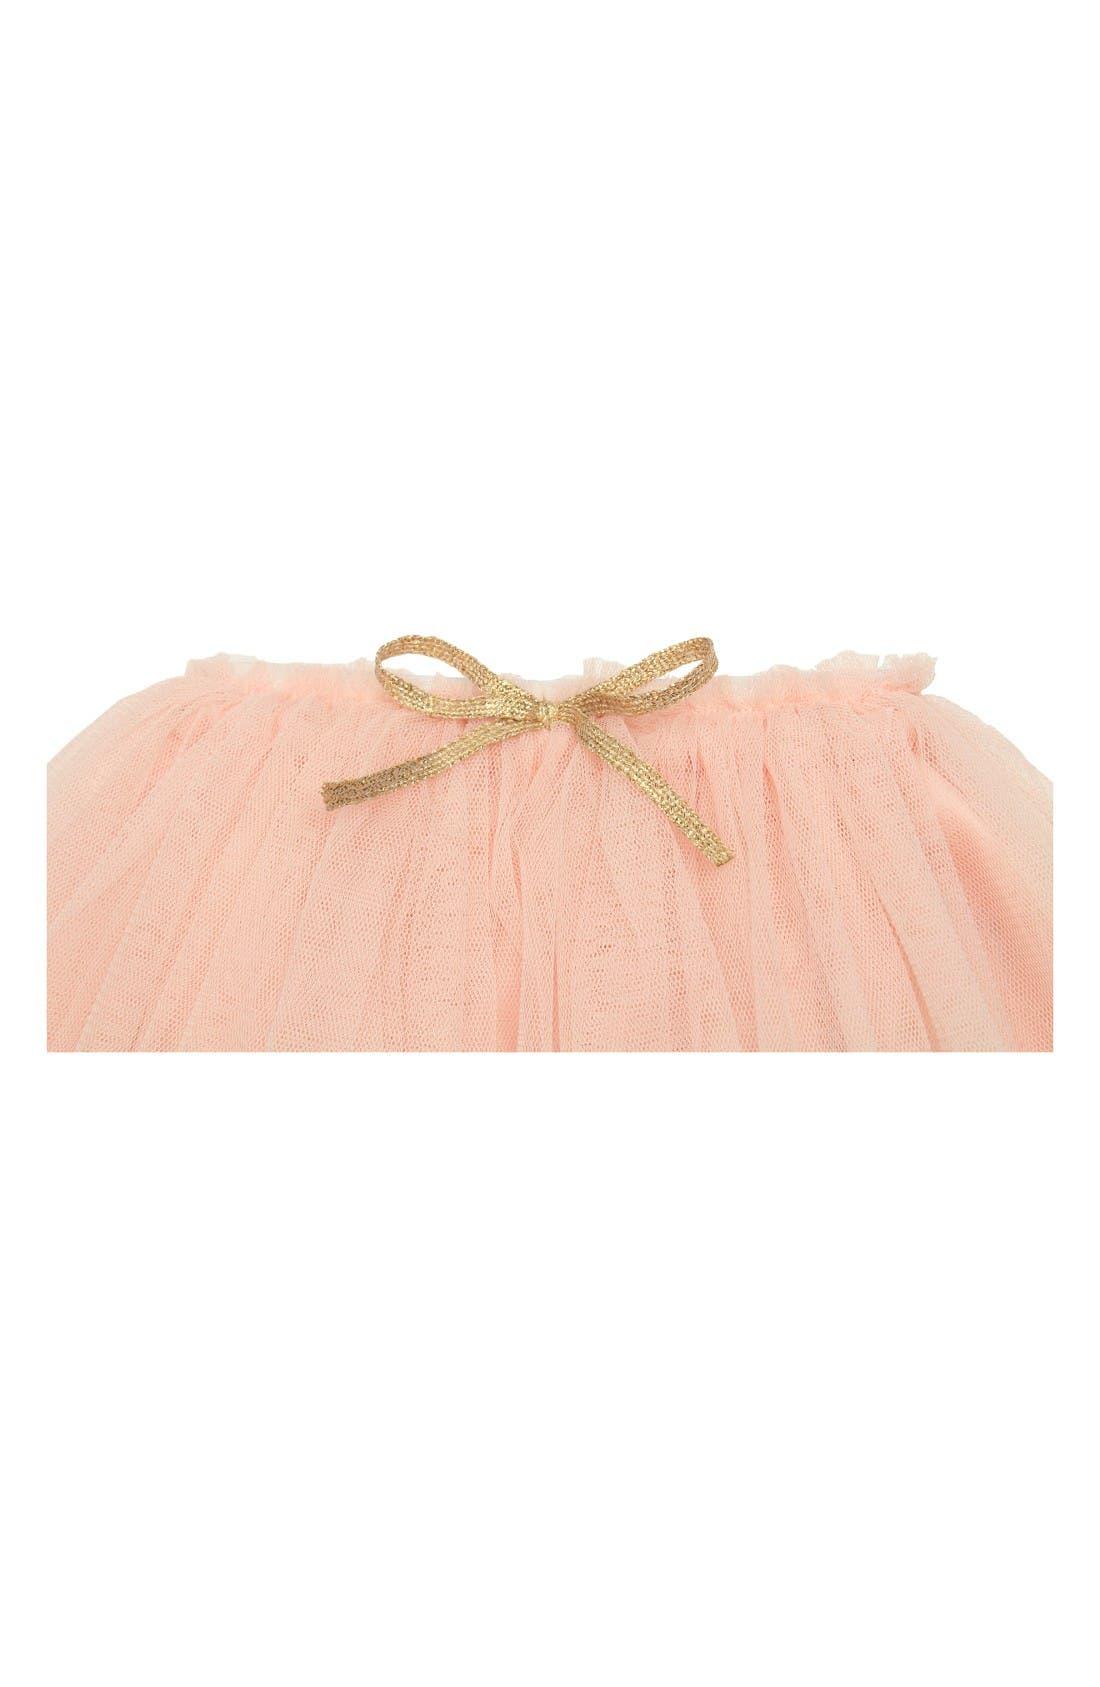 Tutu Skirt,                             Alternate thumbnail 3, color,                             Rose